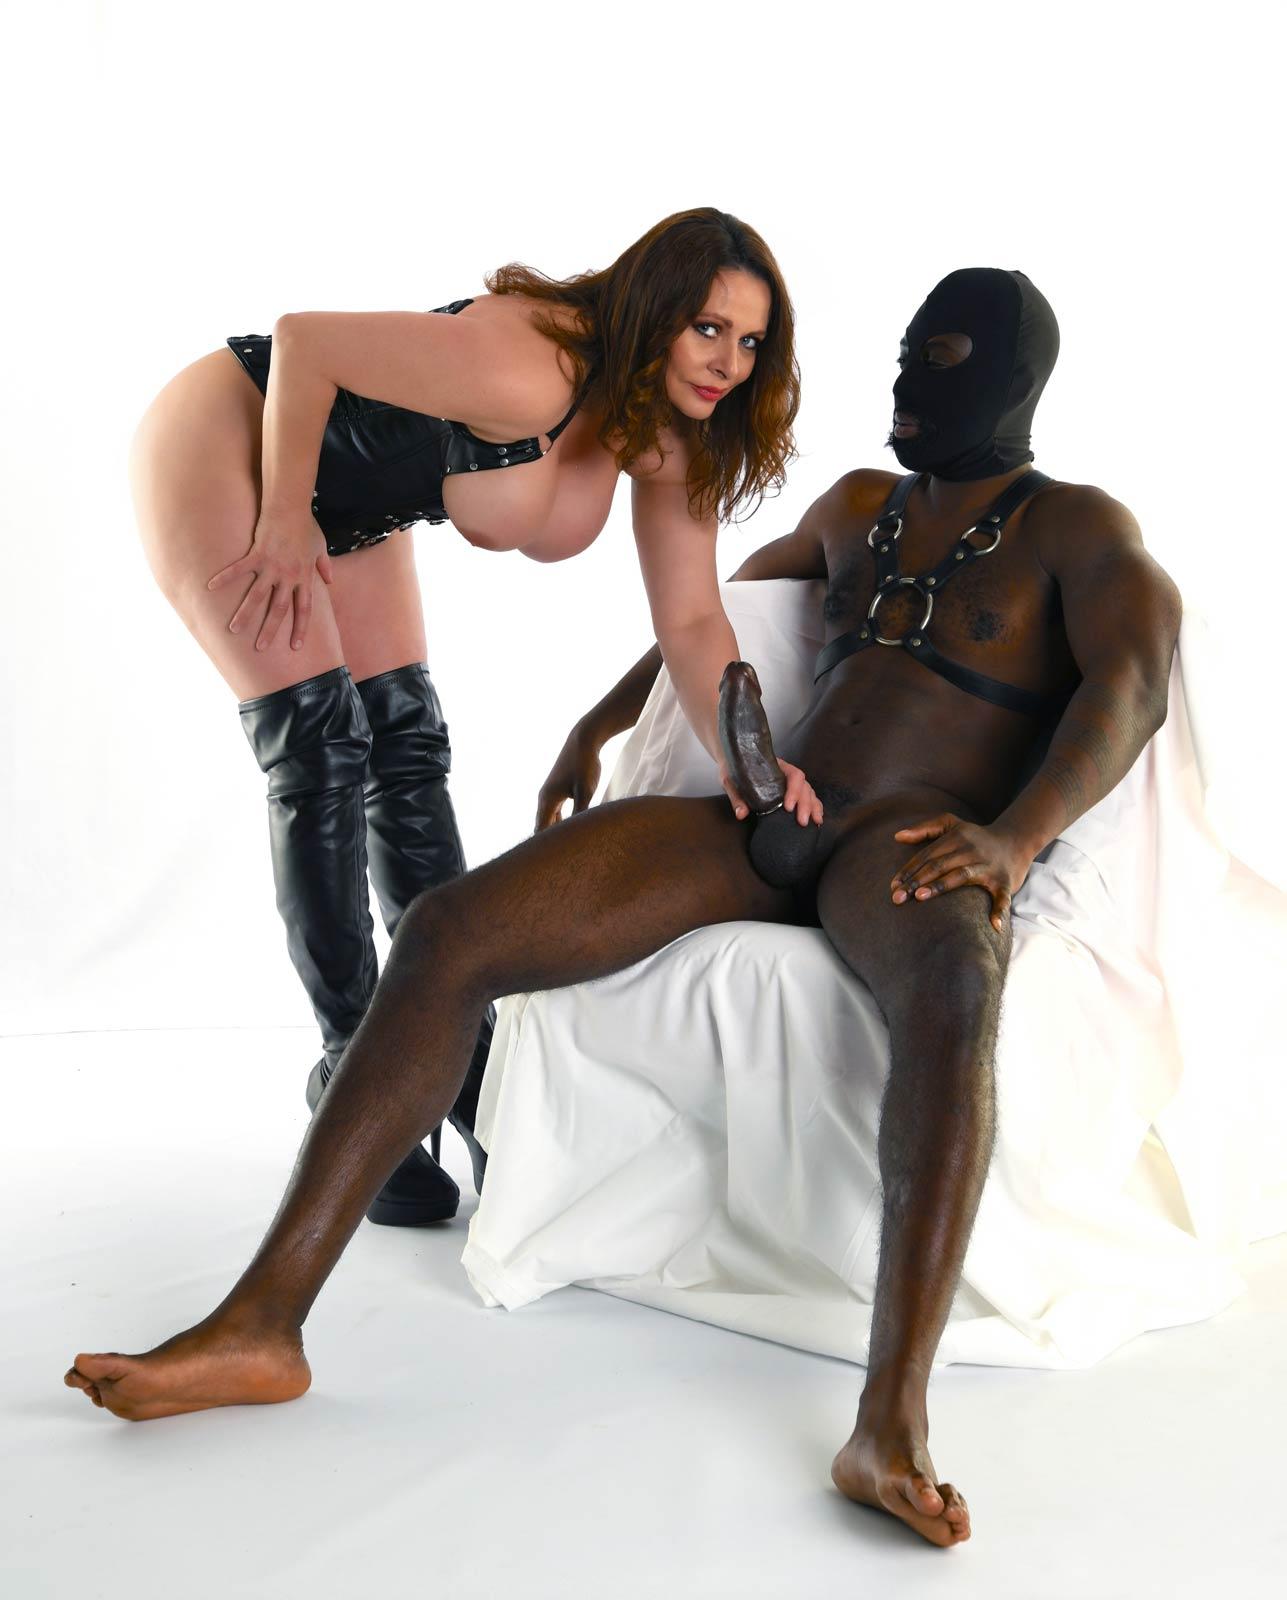 UK Mistress in Ashford, Kent UK | Enforced Bi Session